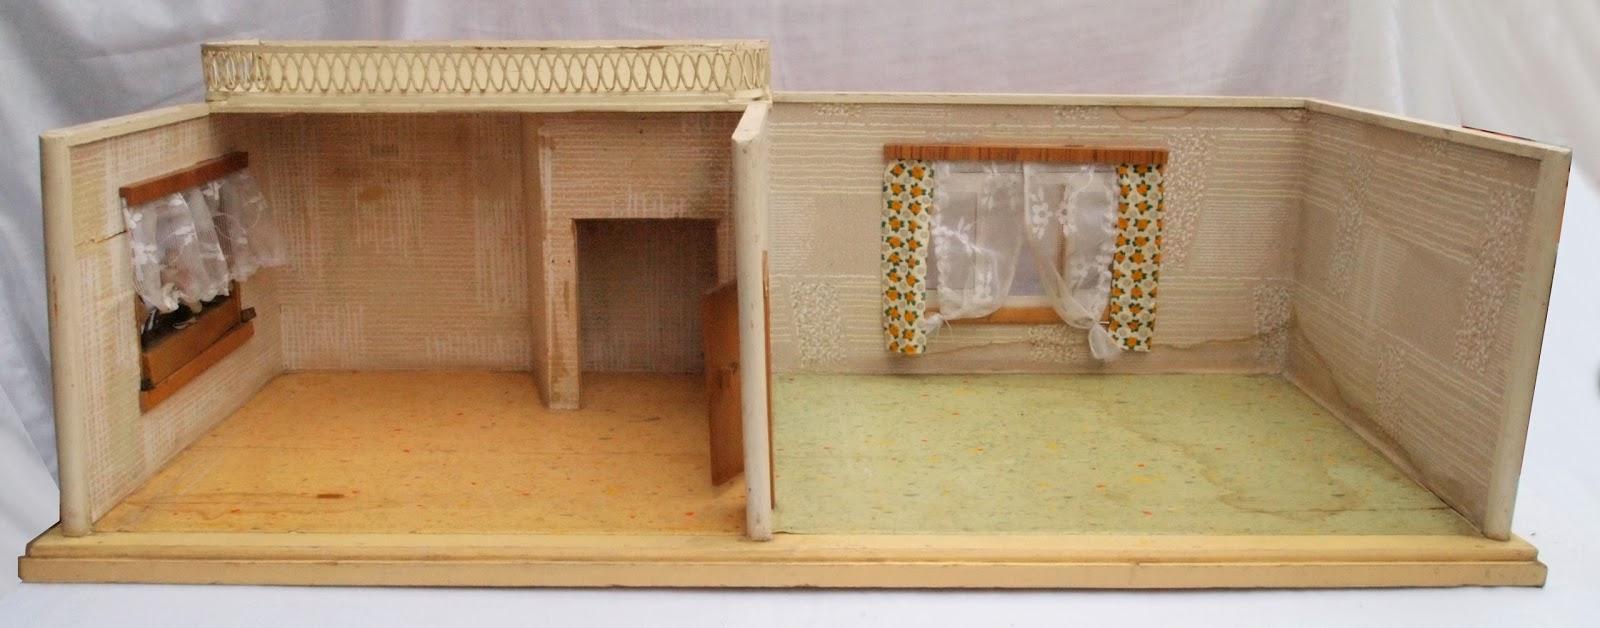 diepuppenstubensammlerin: puppenstube - 1961 c. moritz reichel, Badezimmer ideen